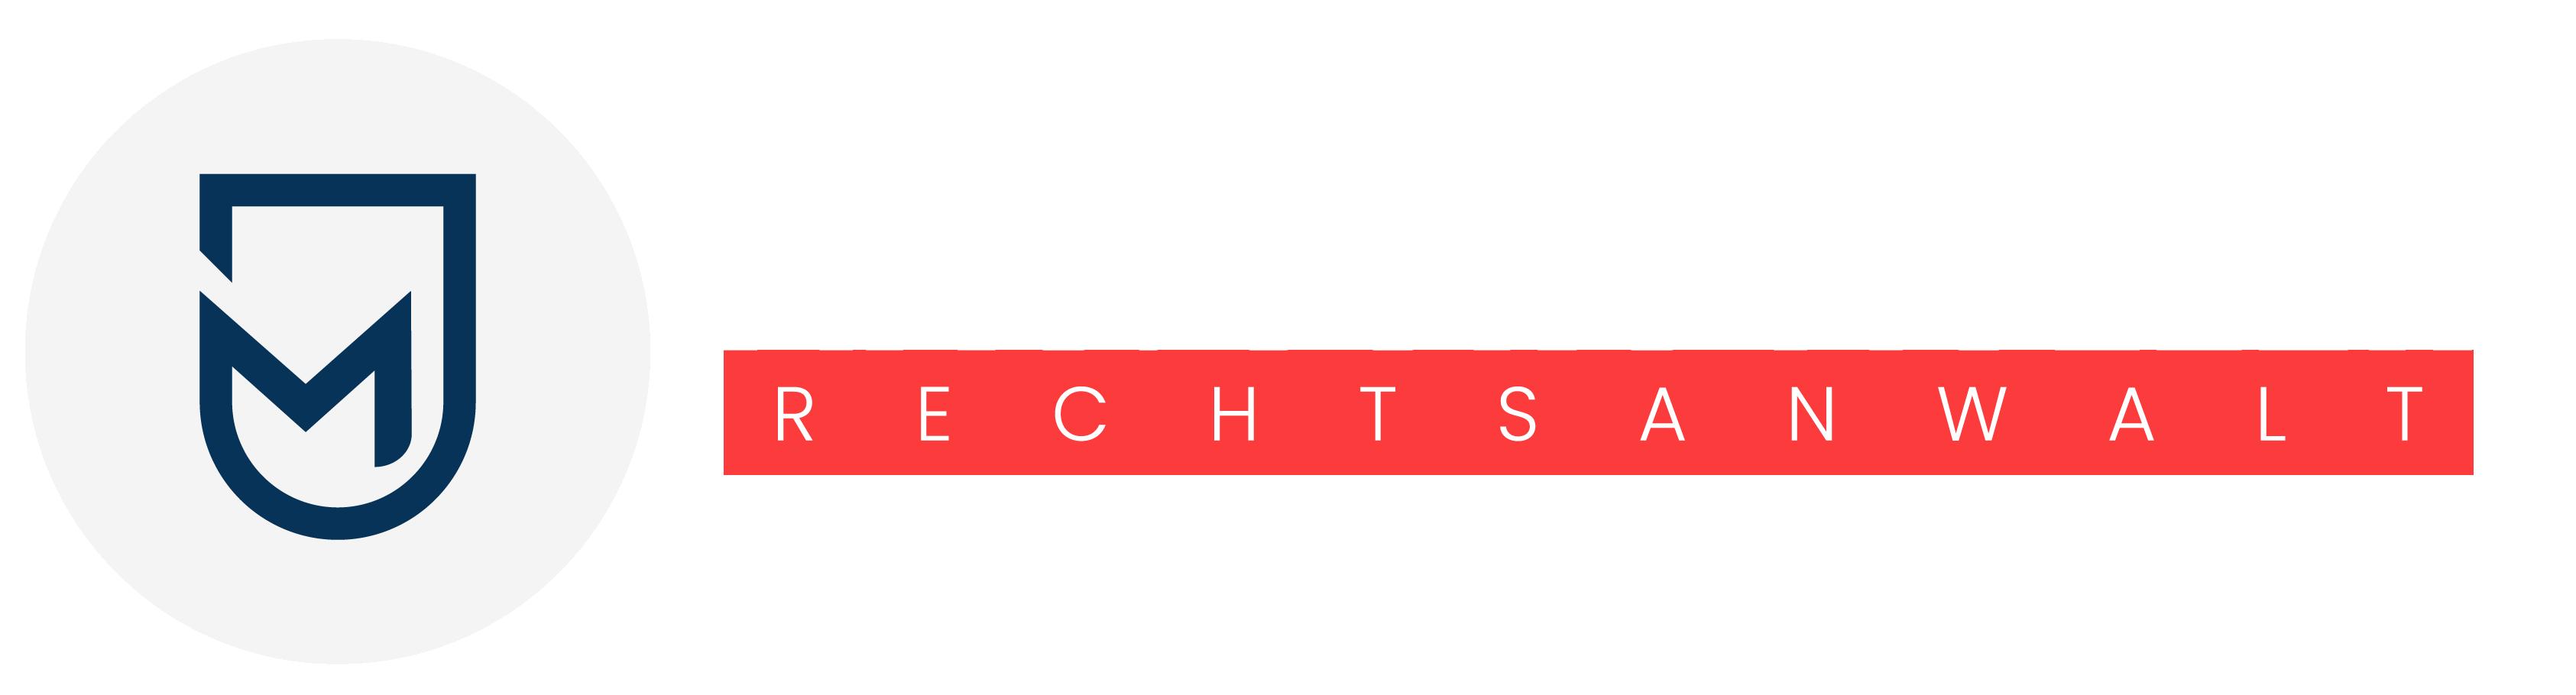 Mag. Jörg C. Müller - Rechtsanwalt in 1010 Wien - Logo